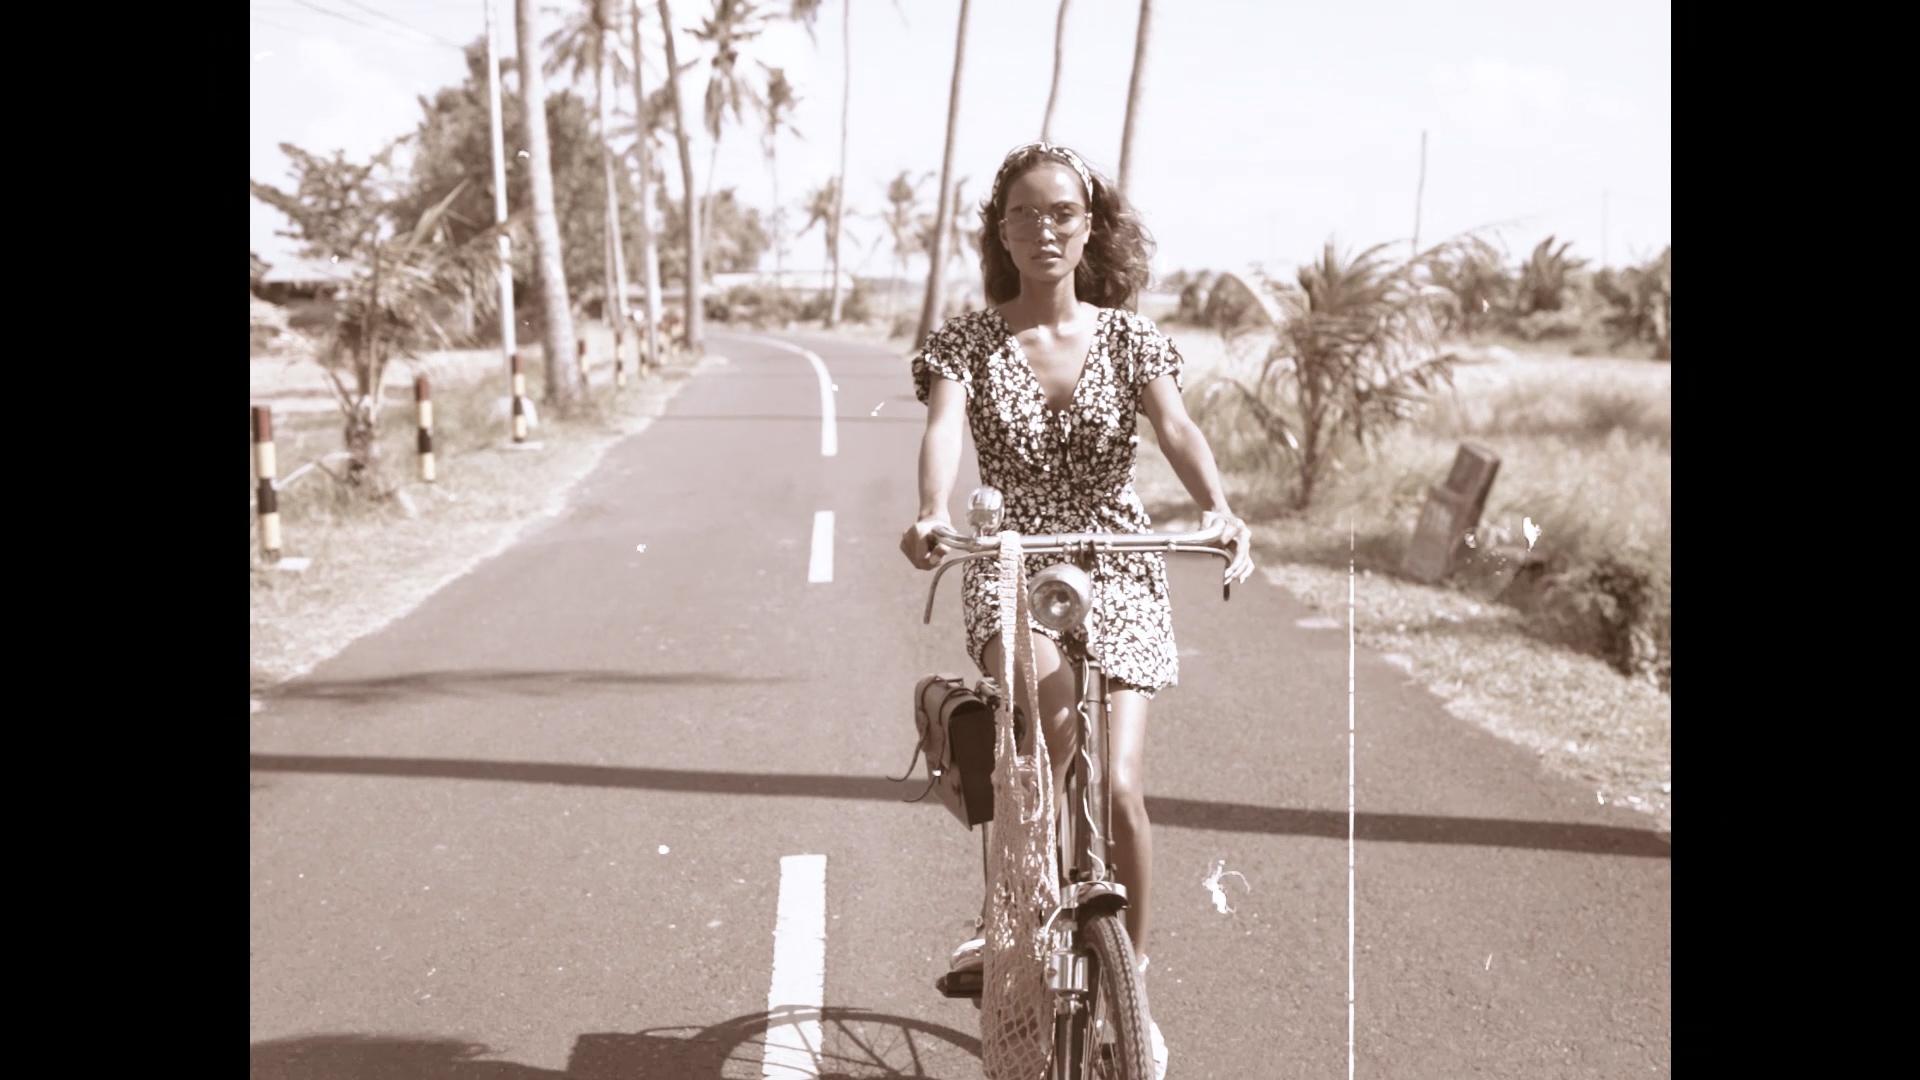 024-cyclingcommando-Putri-Cinta-teaser-stills-5.jpg